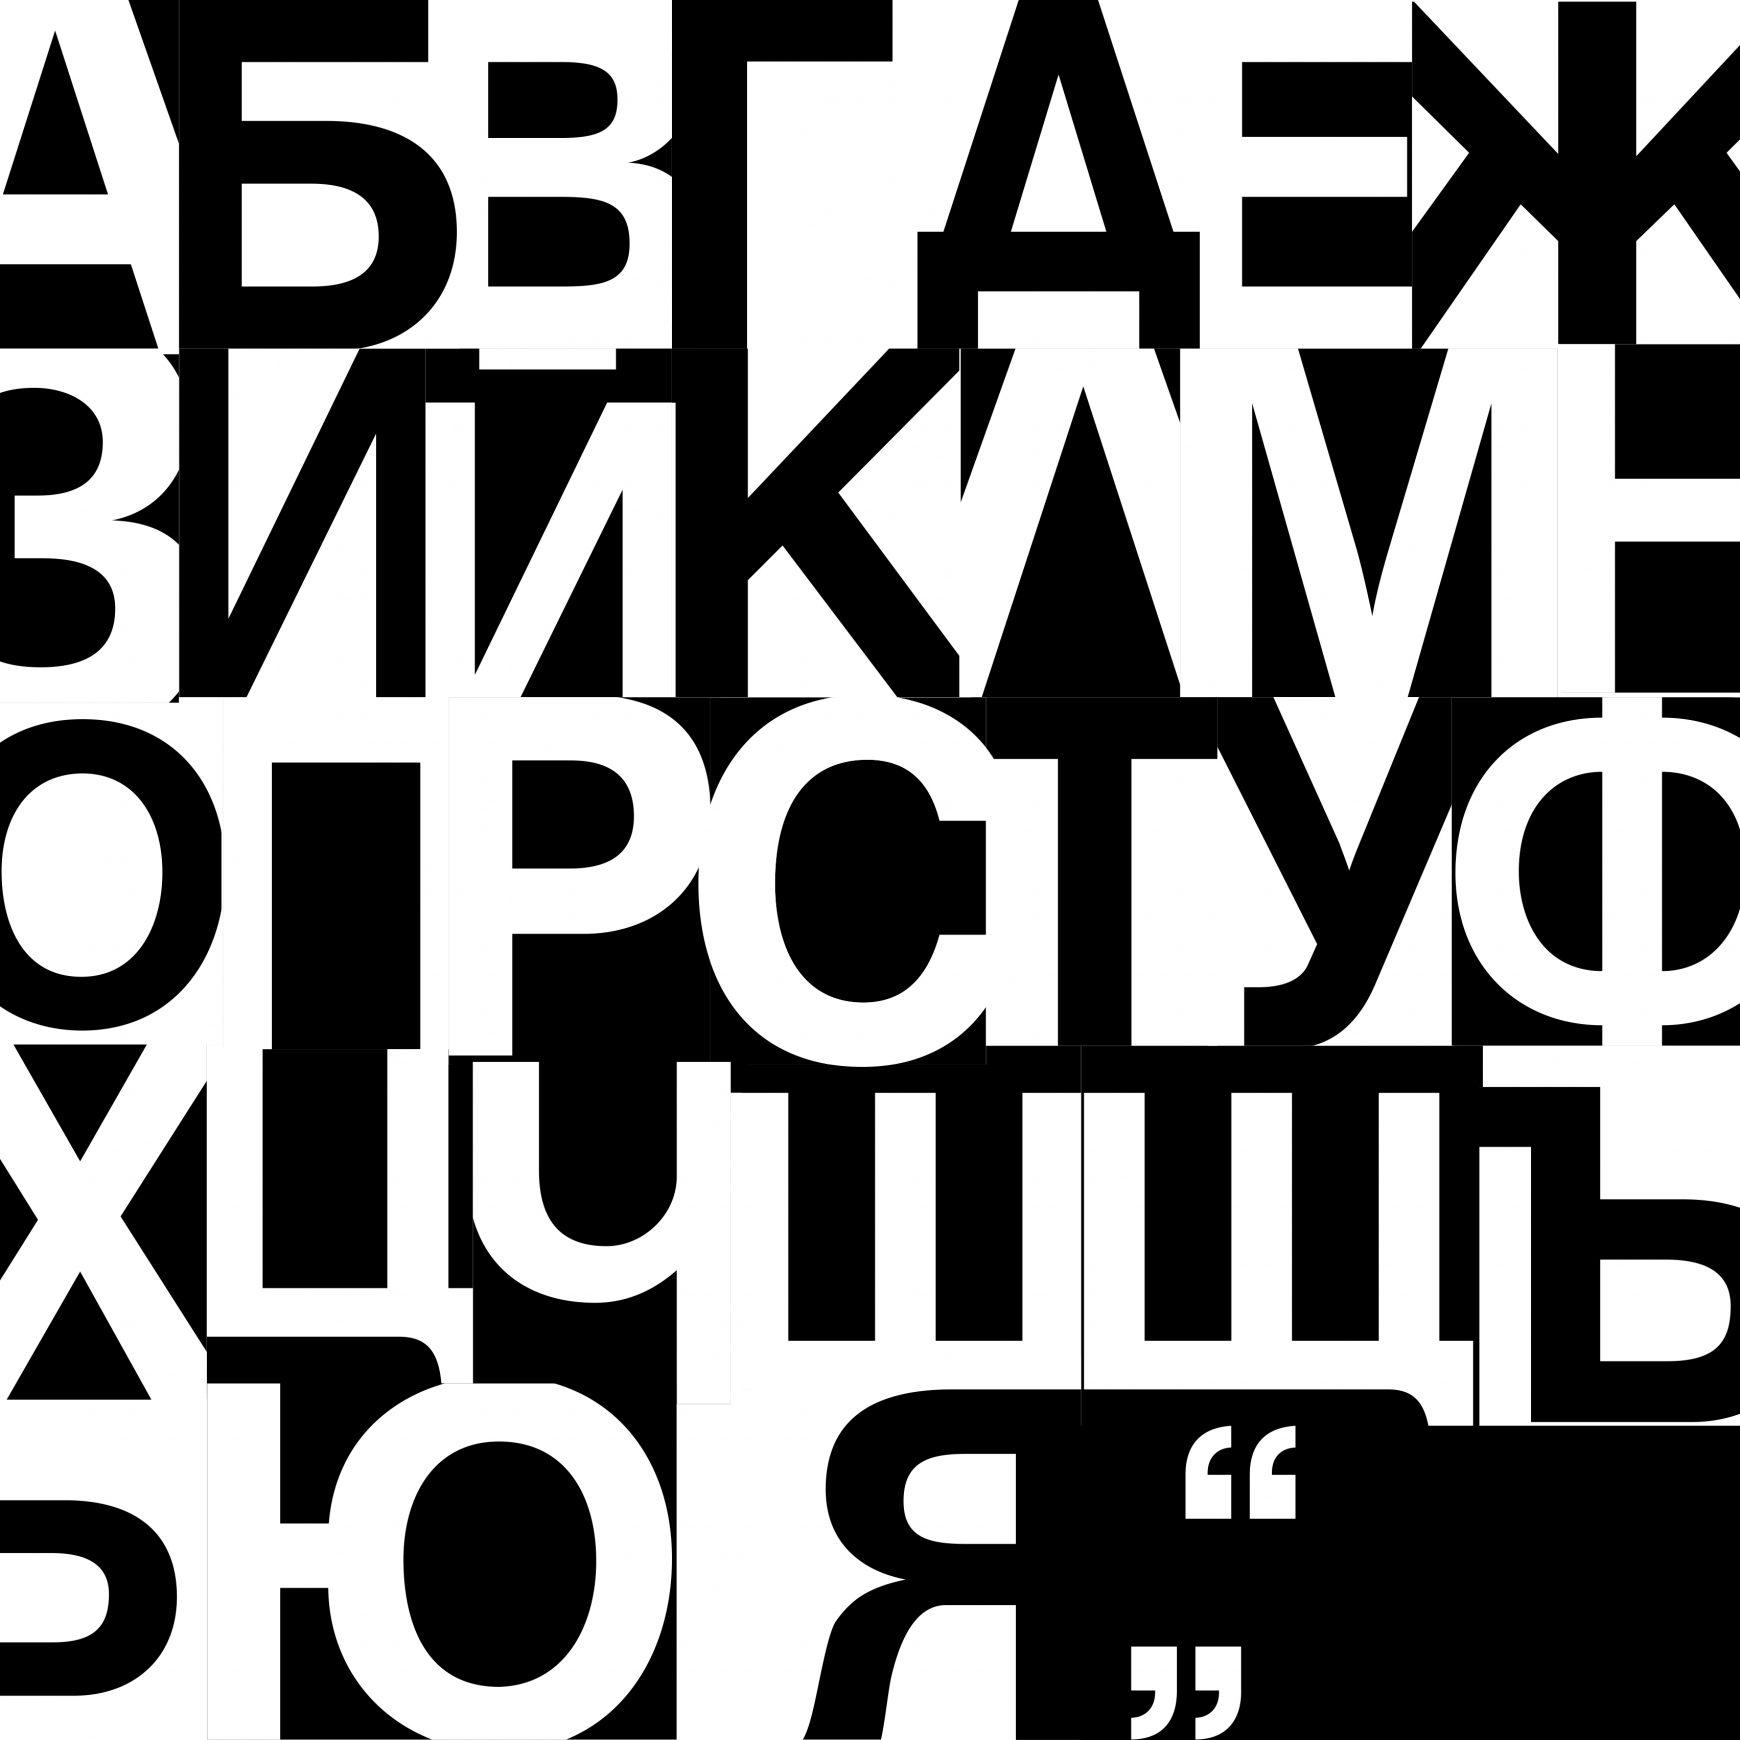 The Cyrillic Writing Script